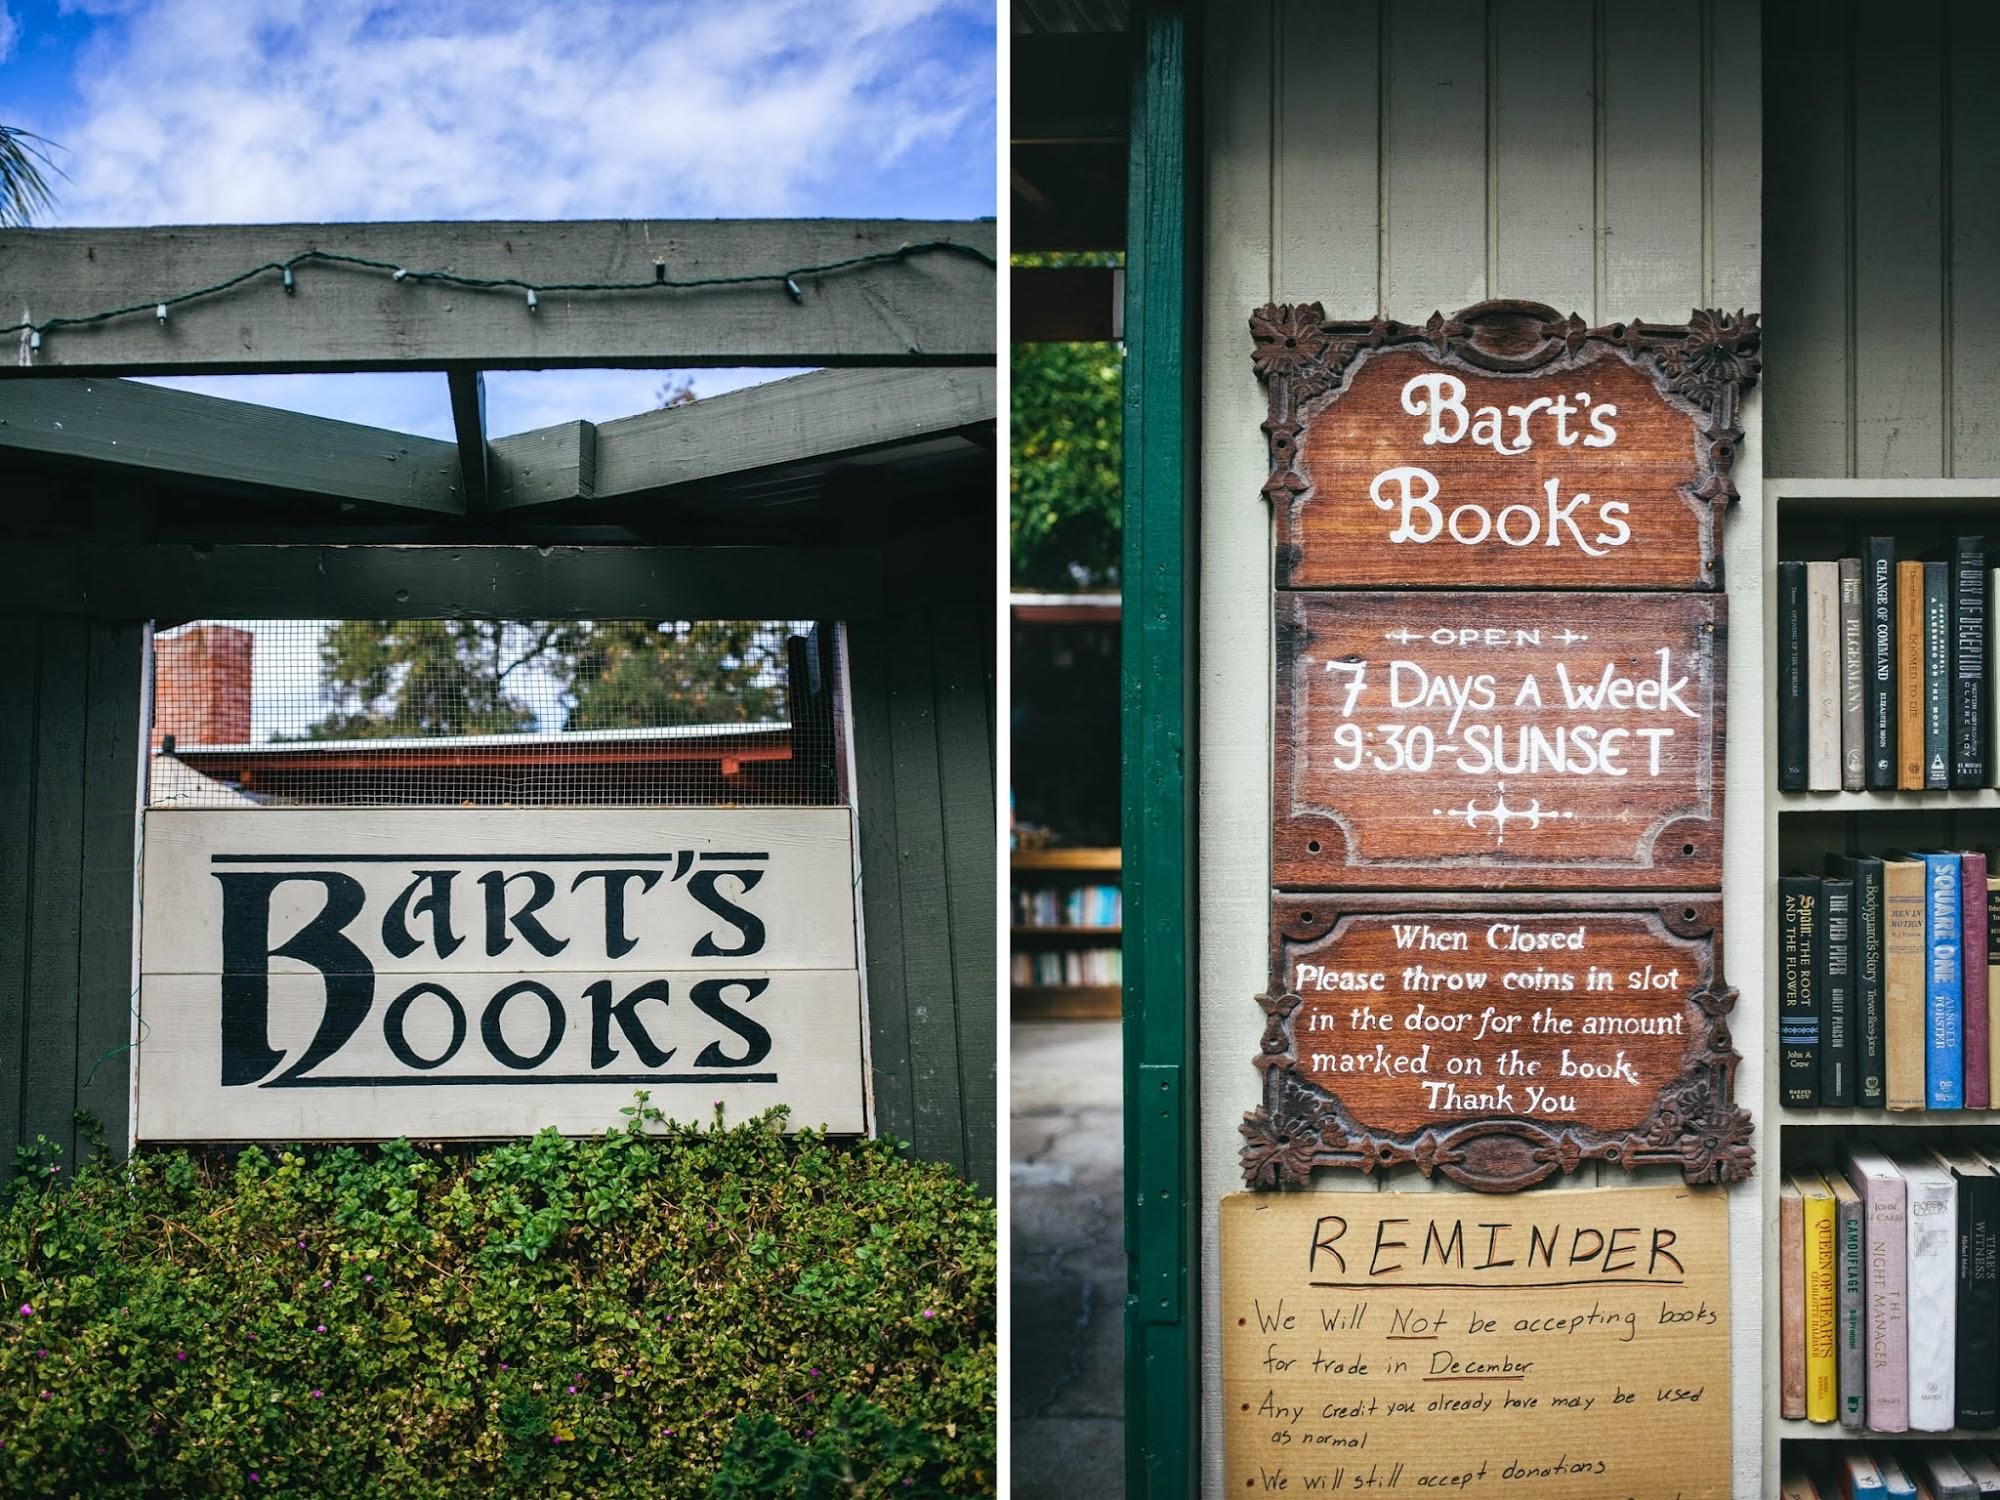 barts+books+ojai+1.jpg